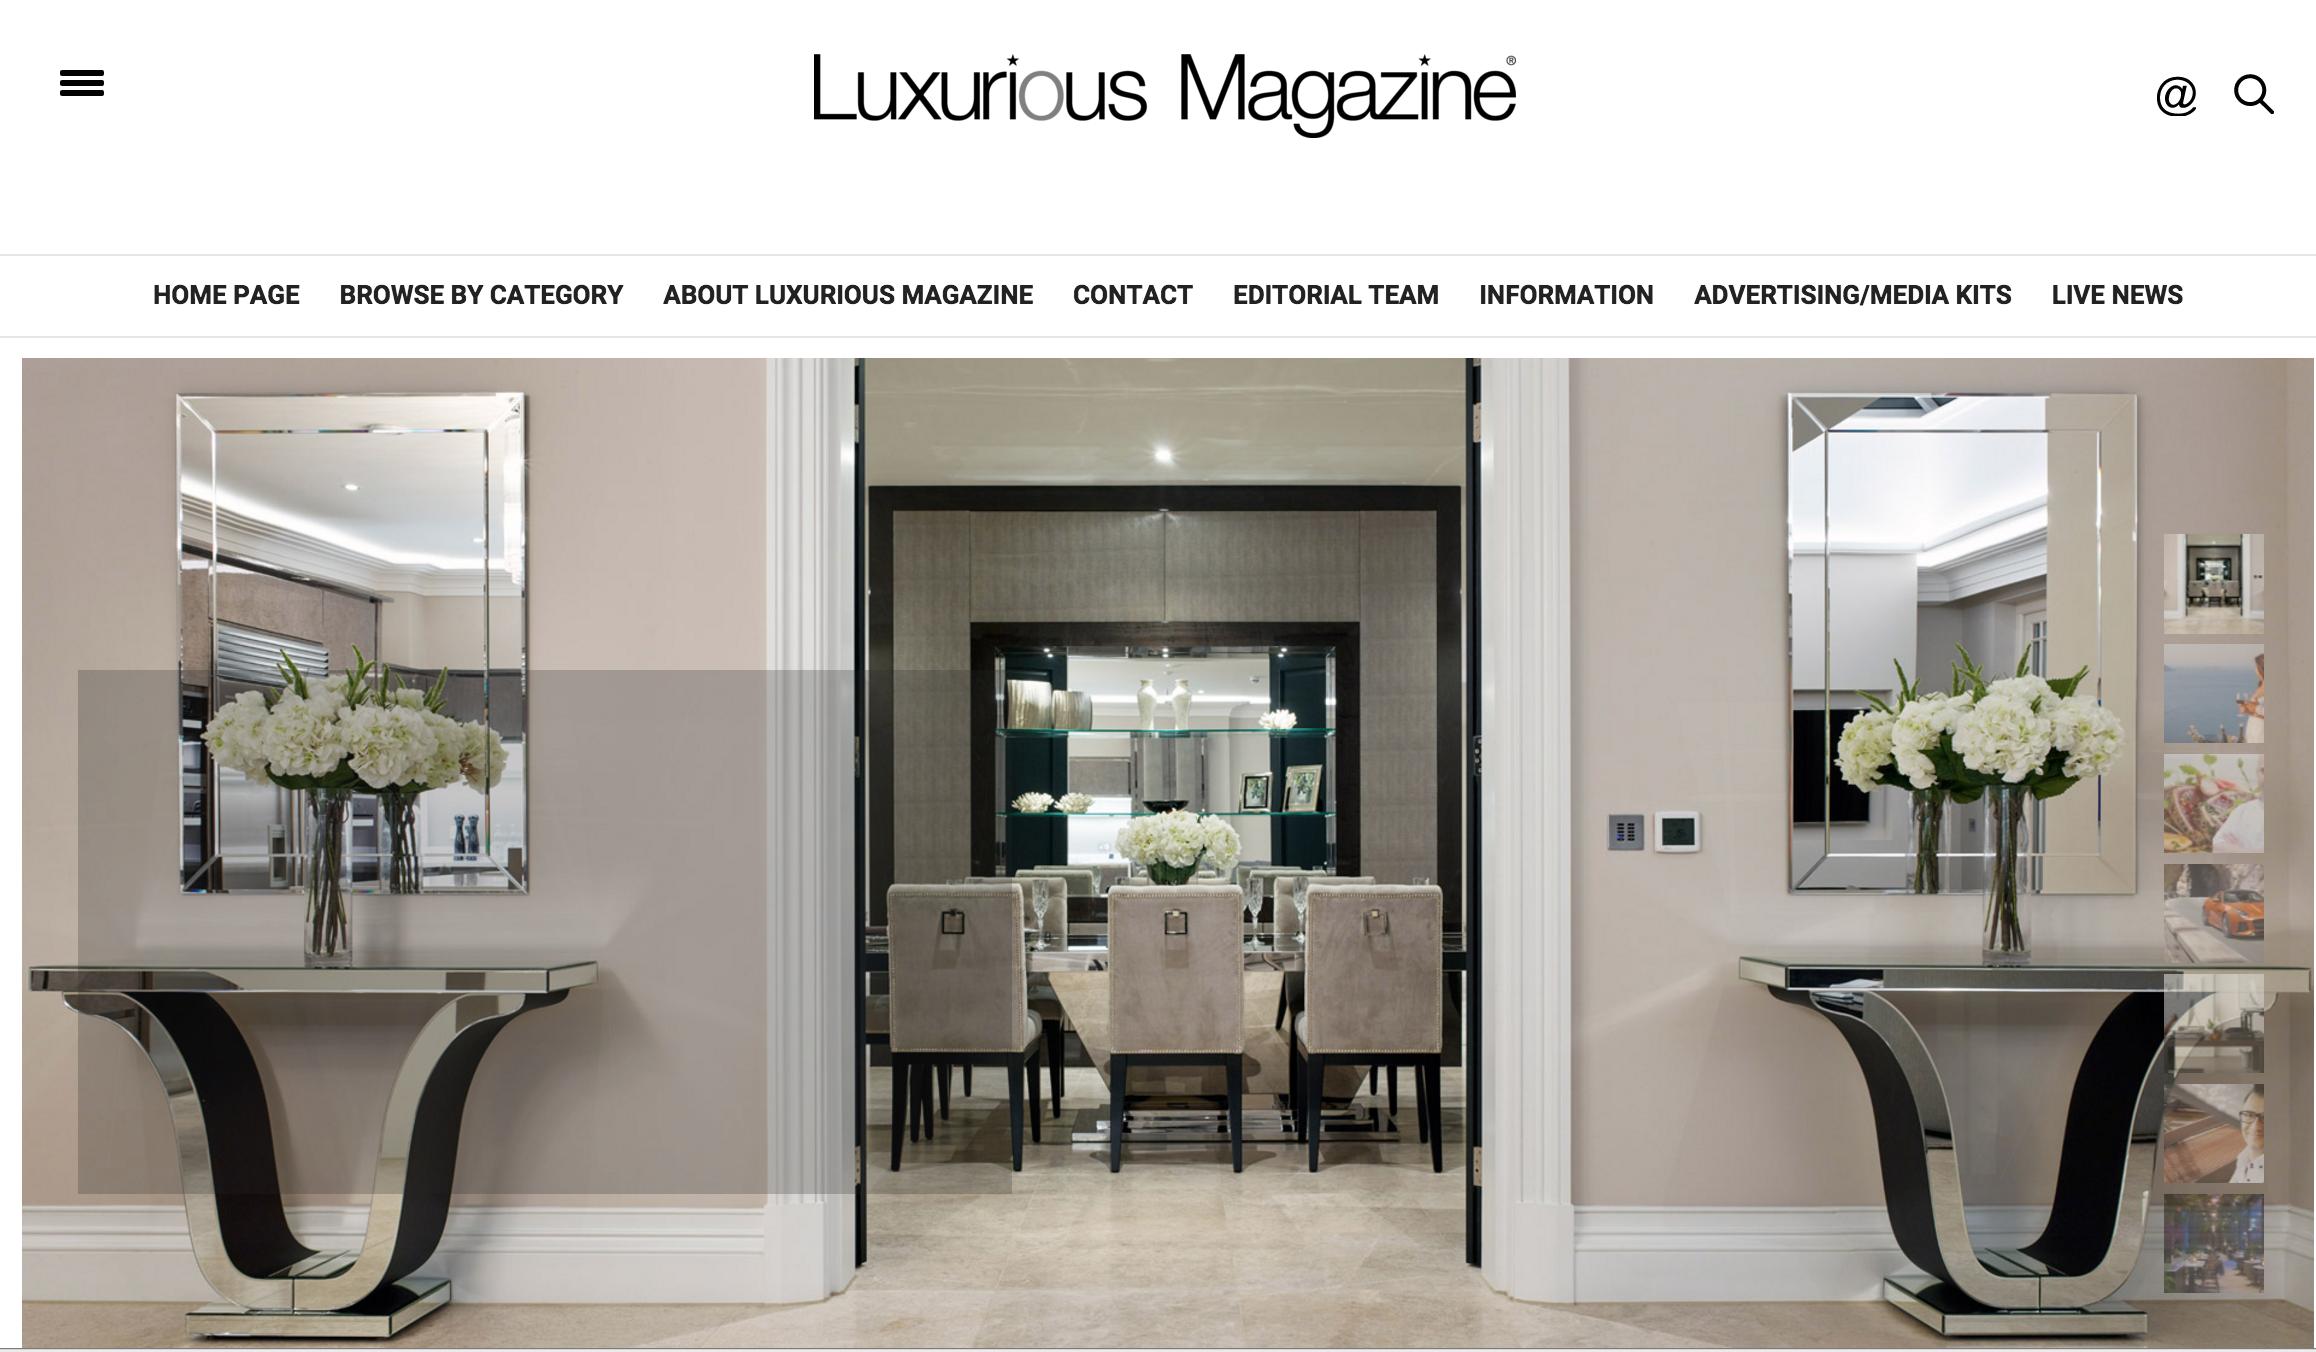 Luxurious Magazine Art of Accessorie